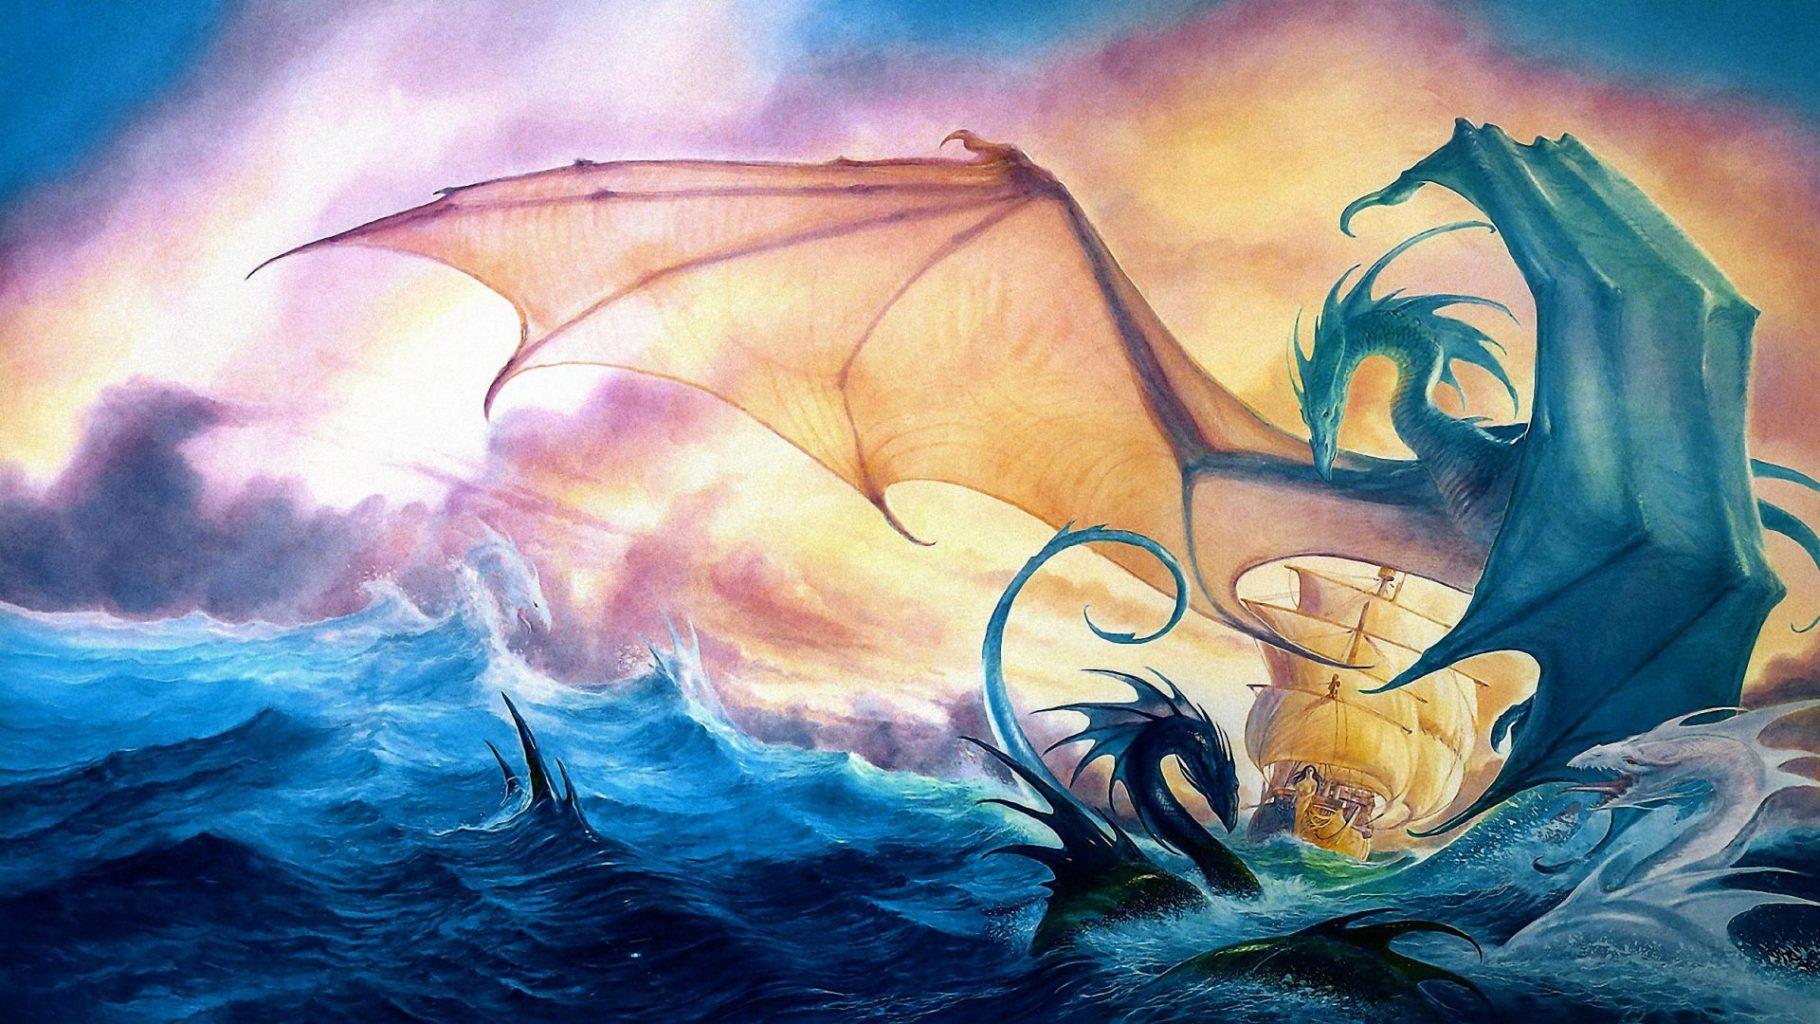 dragoes-marinhos